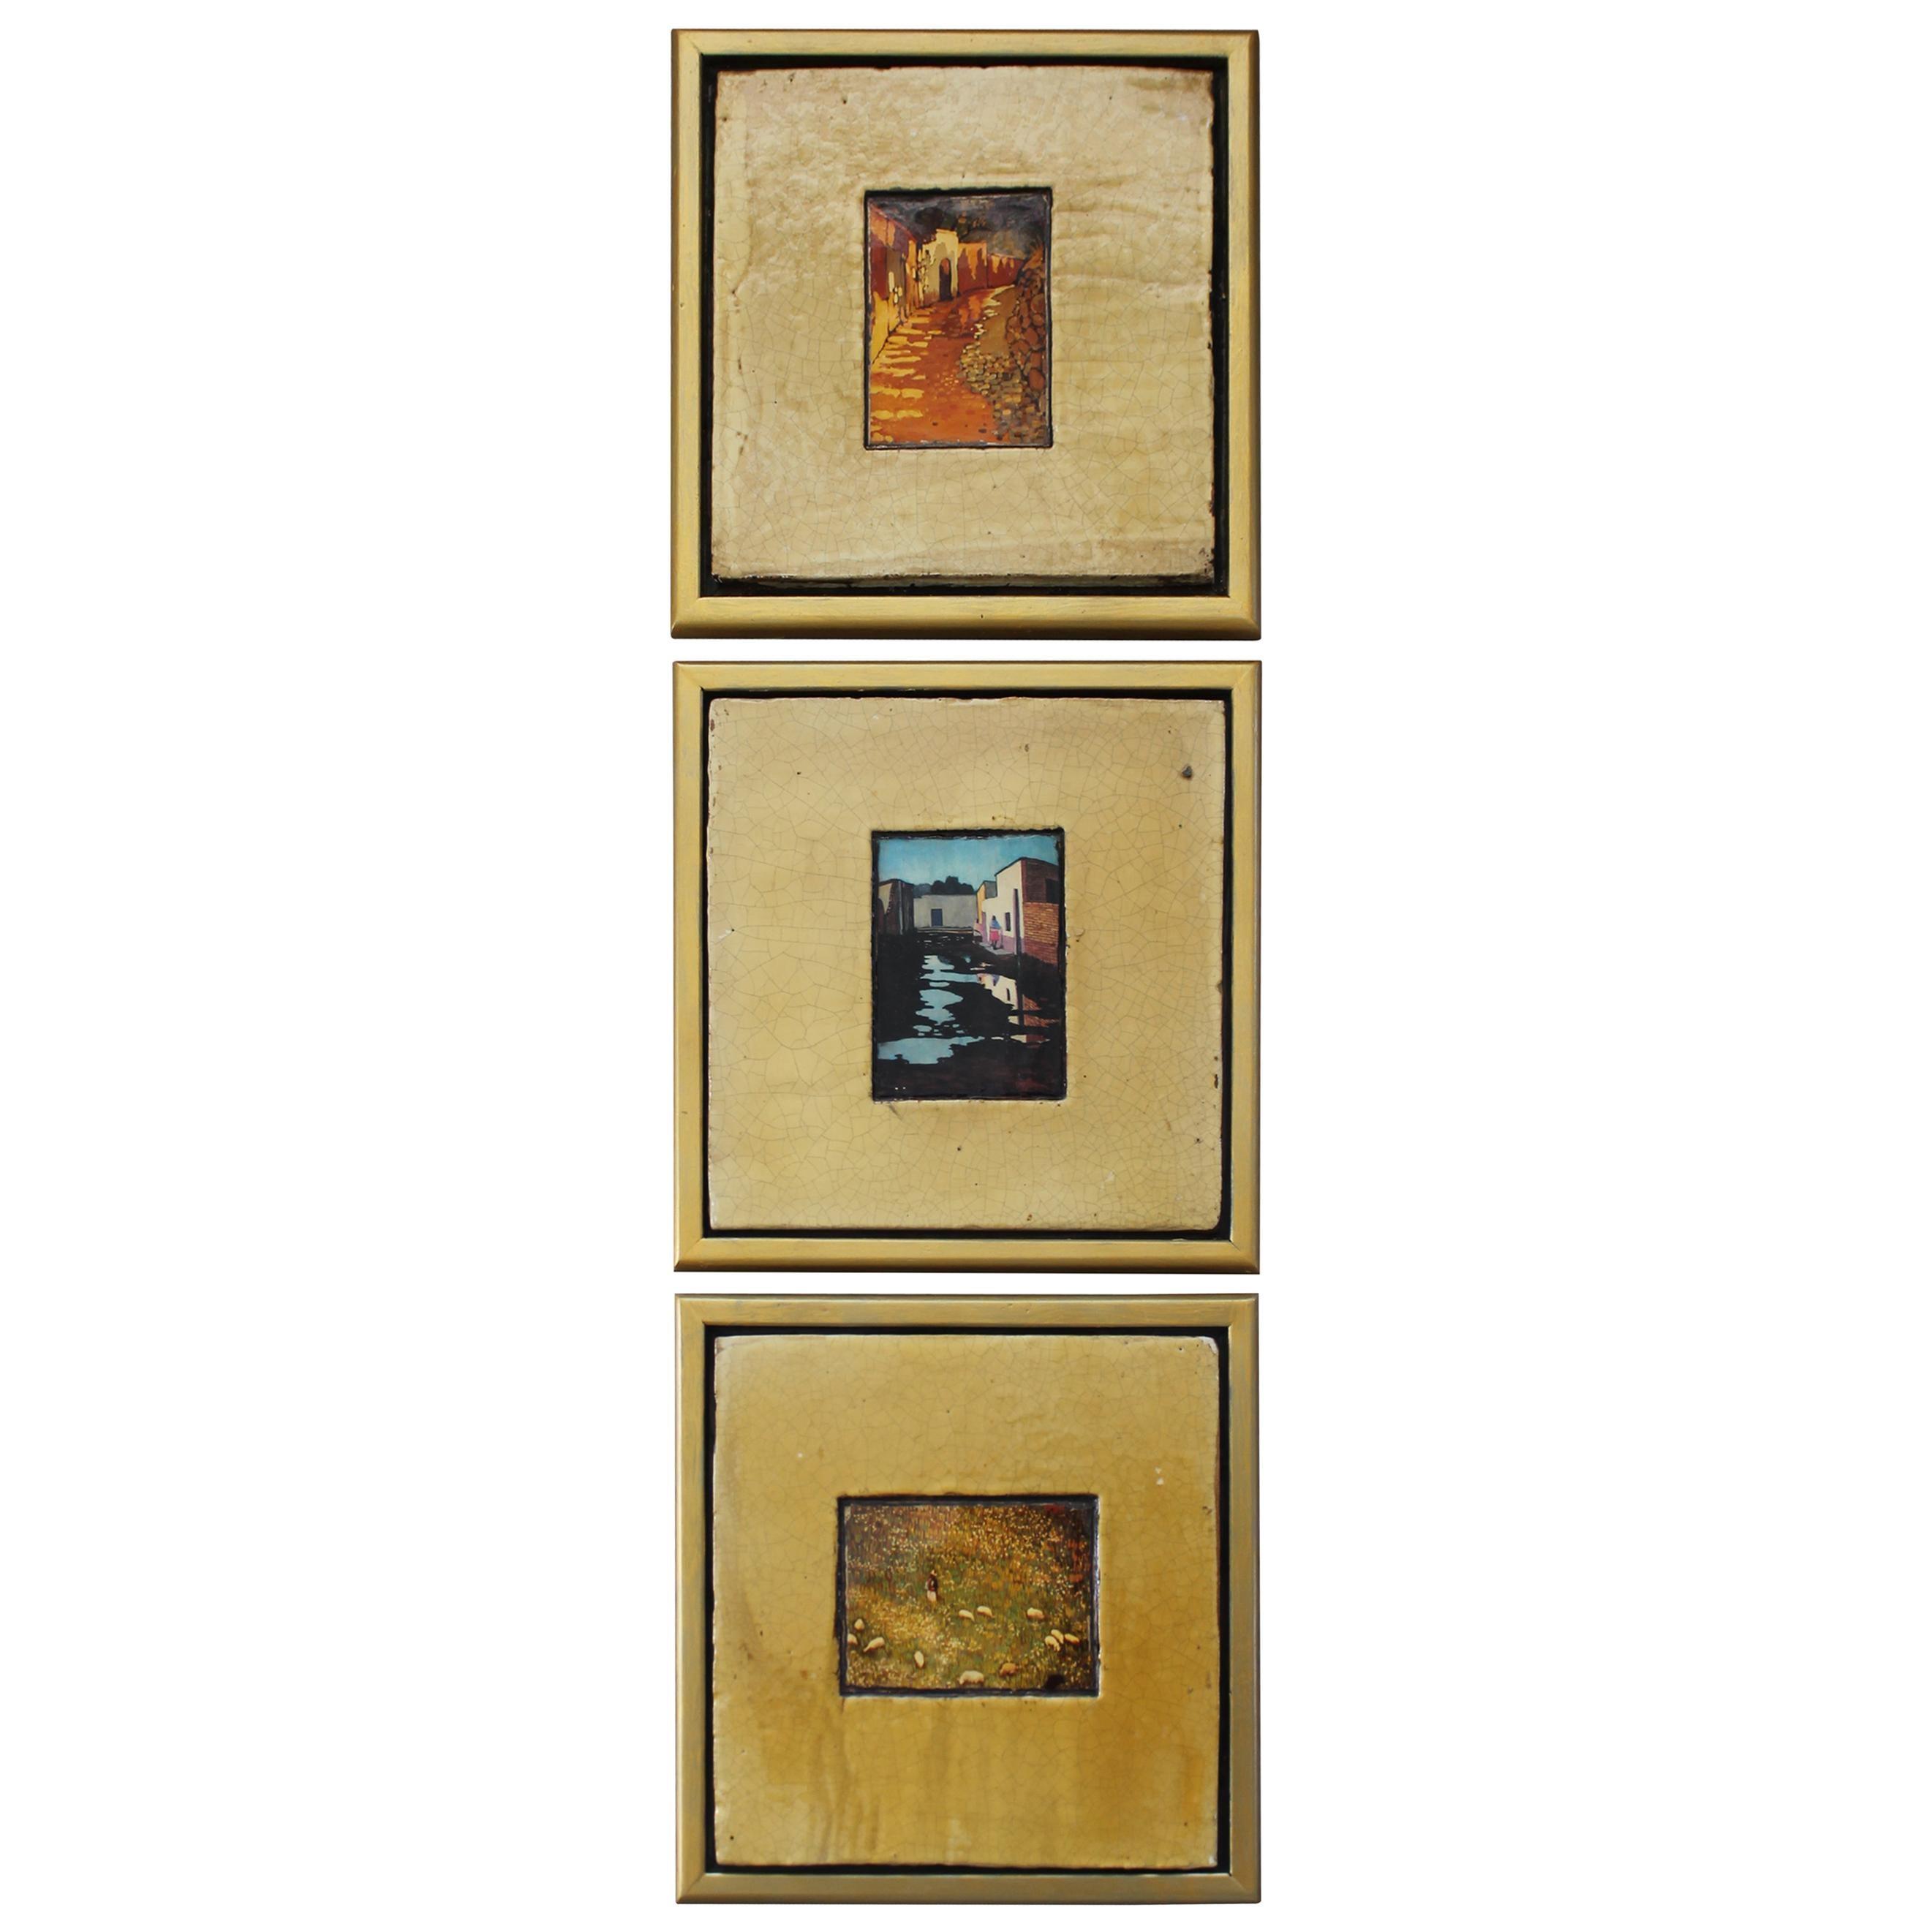 Three Mexican Art Tiles by Daniel Rueffert